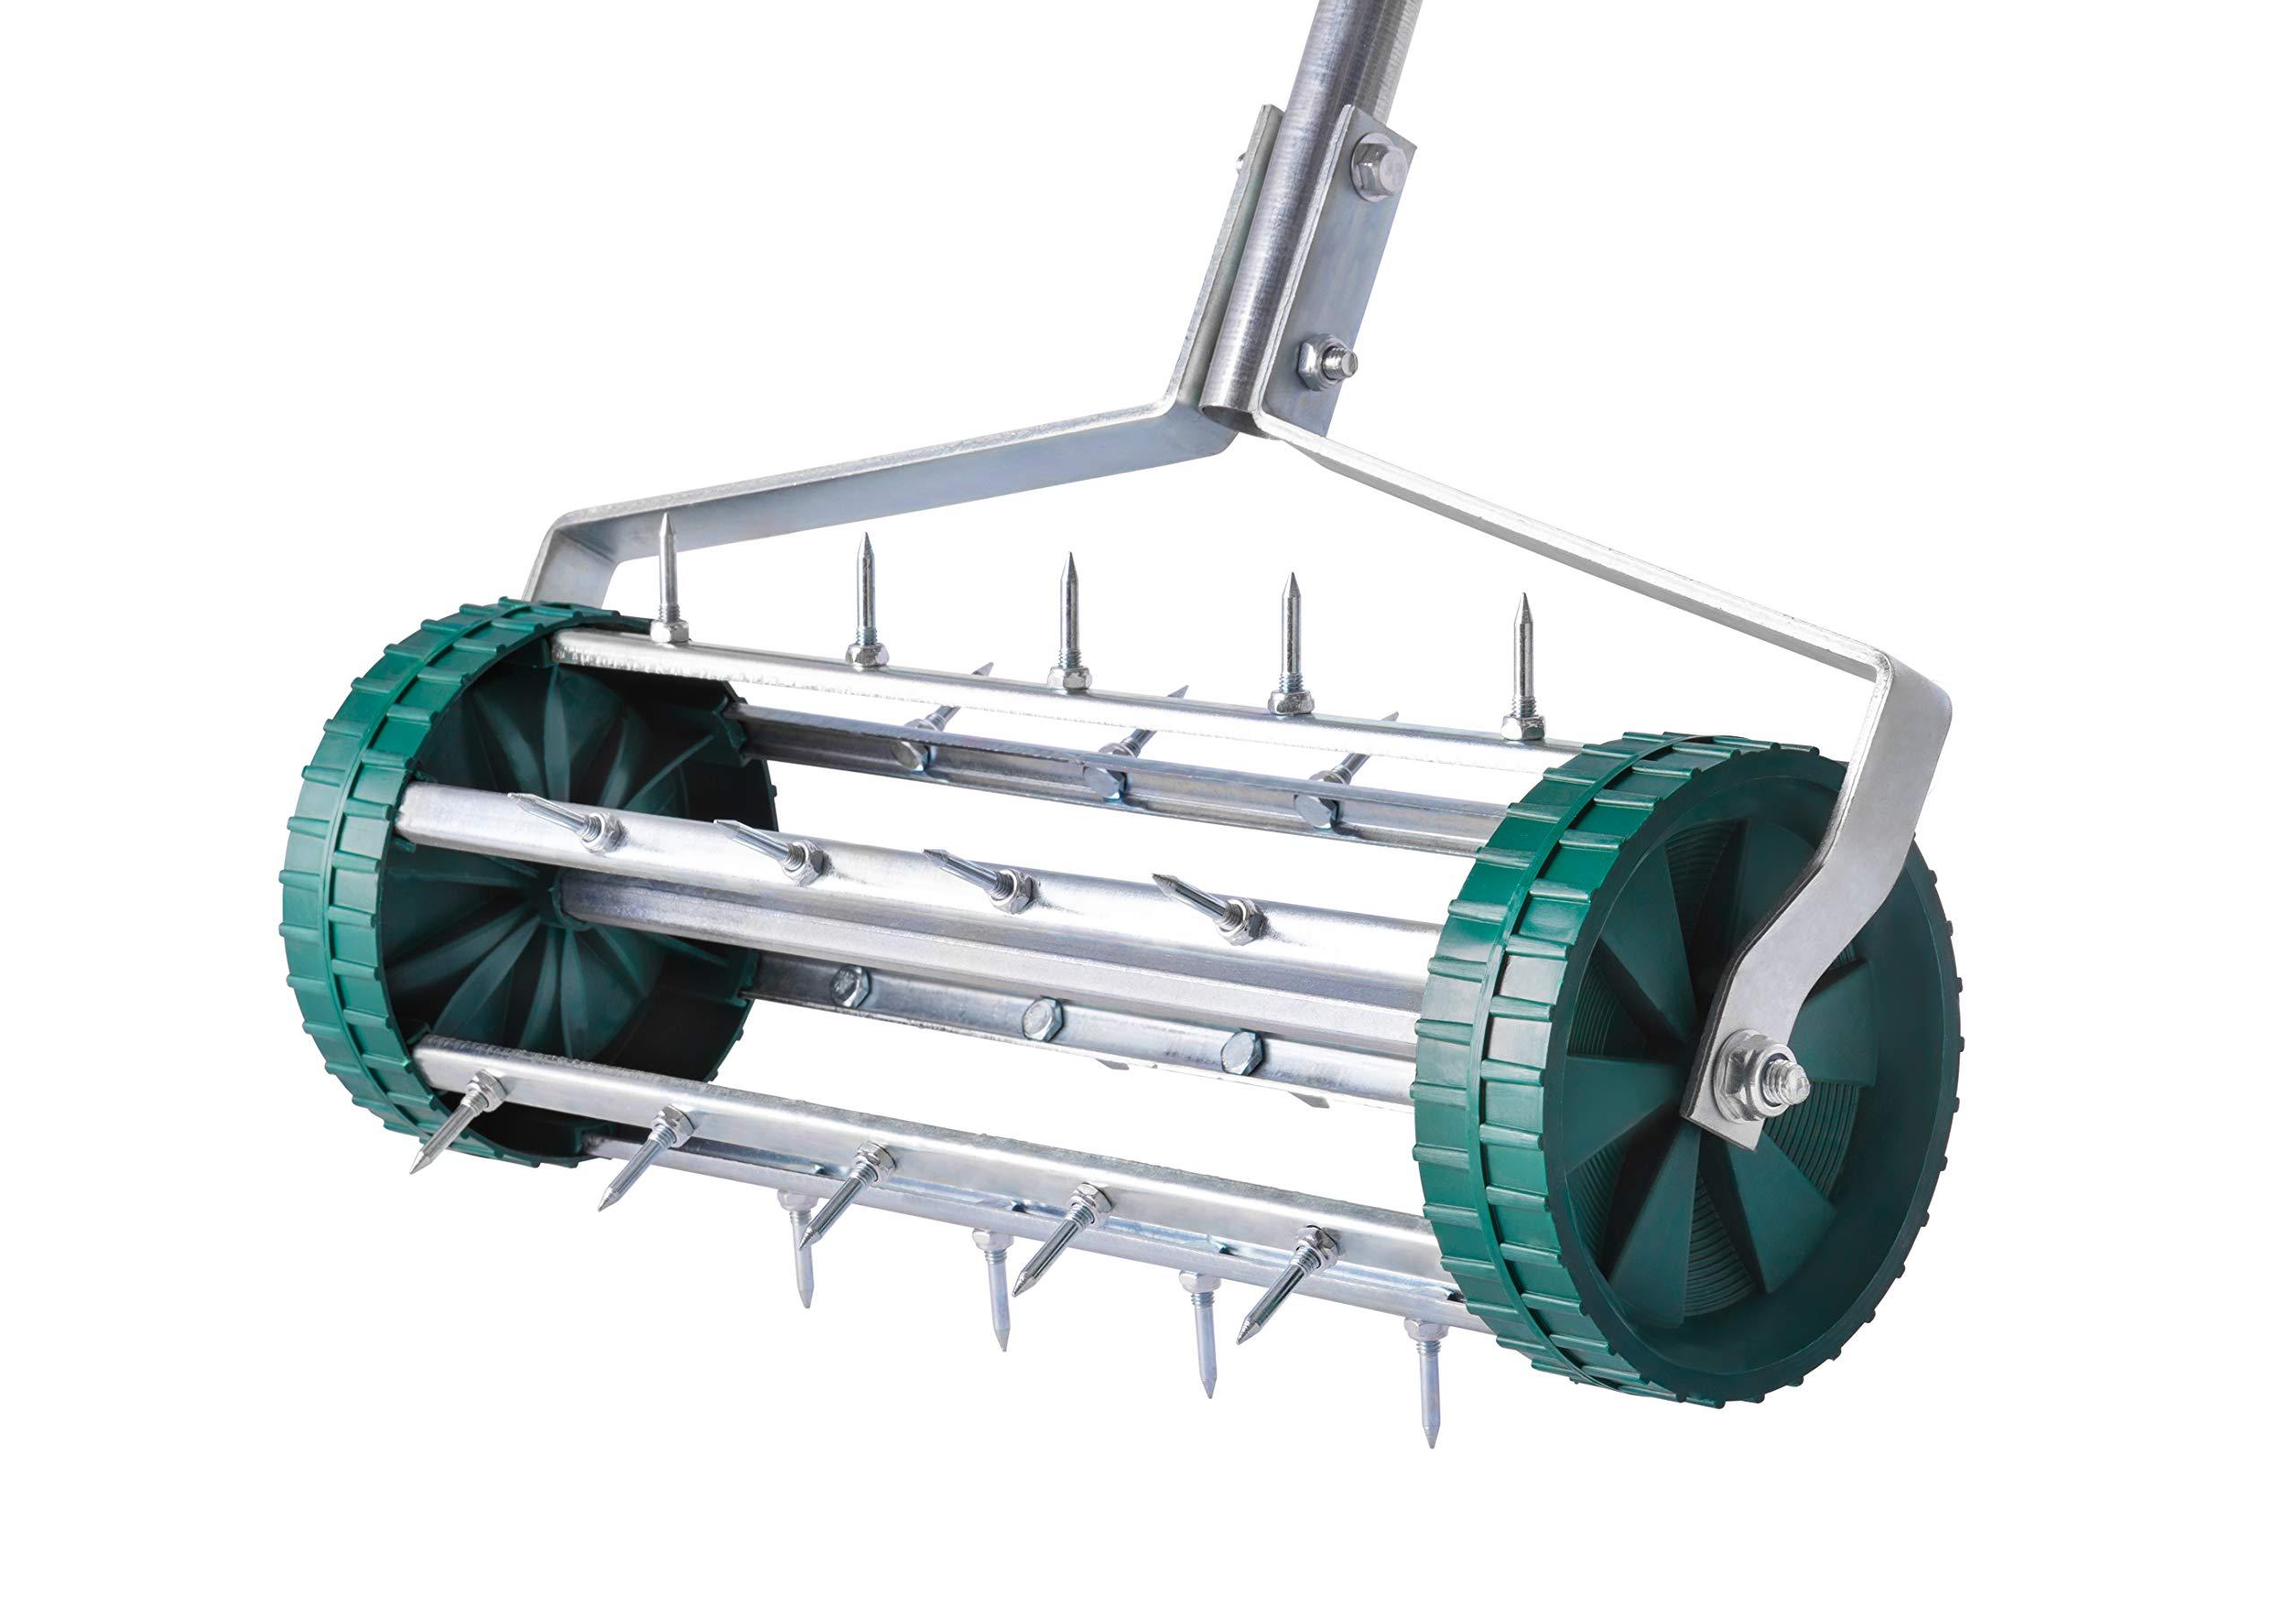 UPP® rodillo aireador de césped I aireador de césped de acero I rodillo de jardín